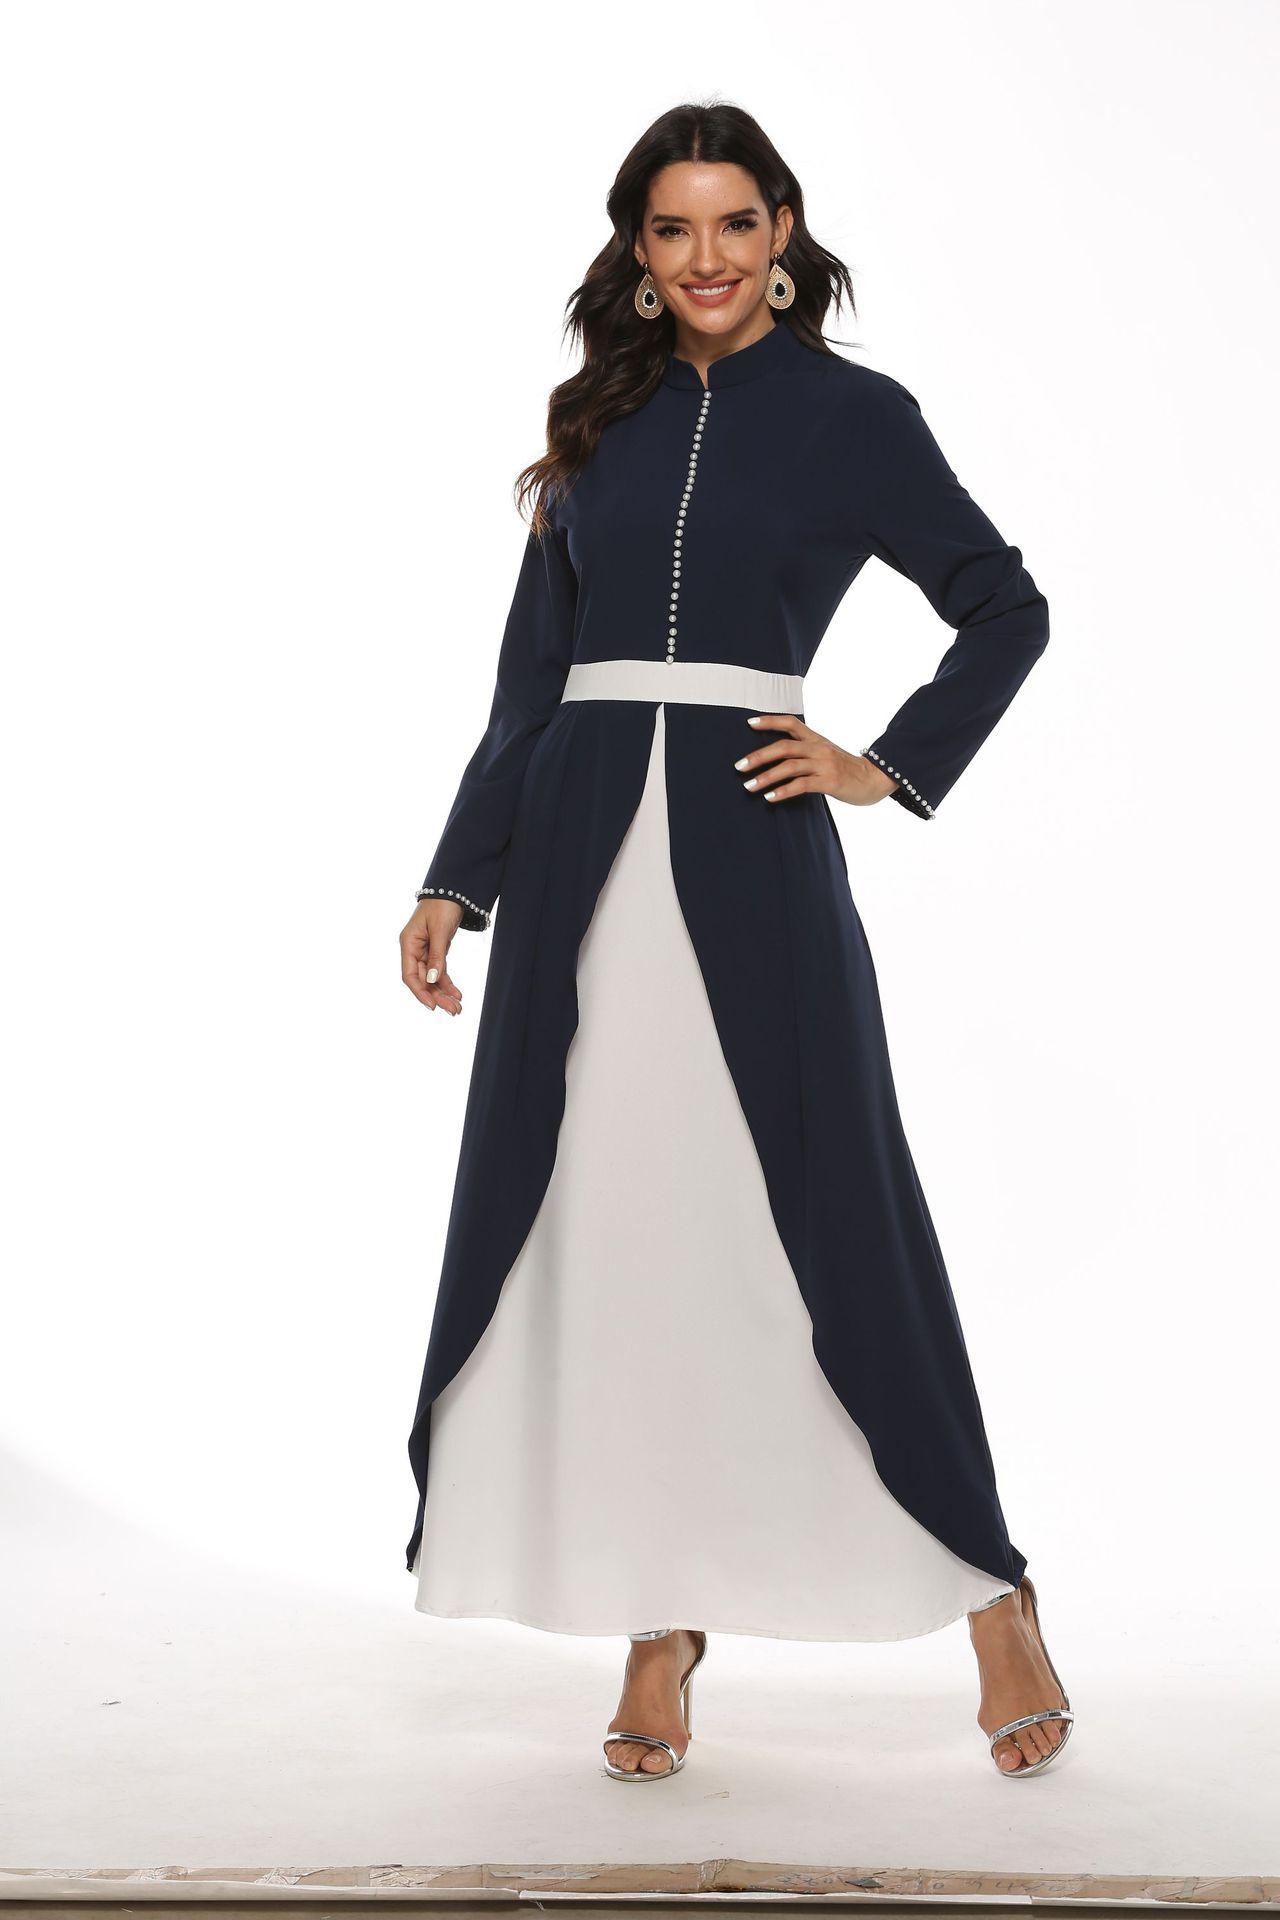 Abaya Dubai Hijab Robe Femmes Musulmanes Caftan turque Robes Kaftan Marocain Islam Vêtements Vestidos Robe Longue Musulmane